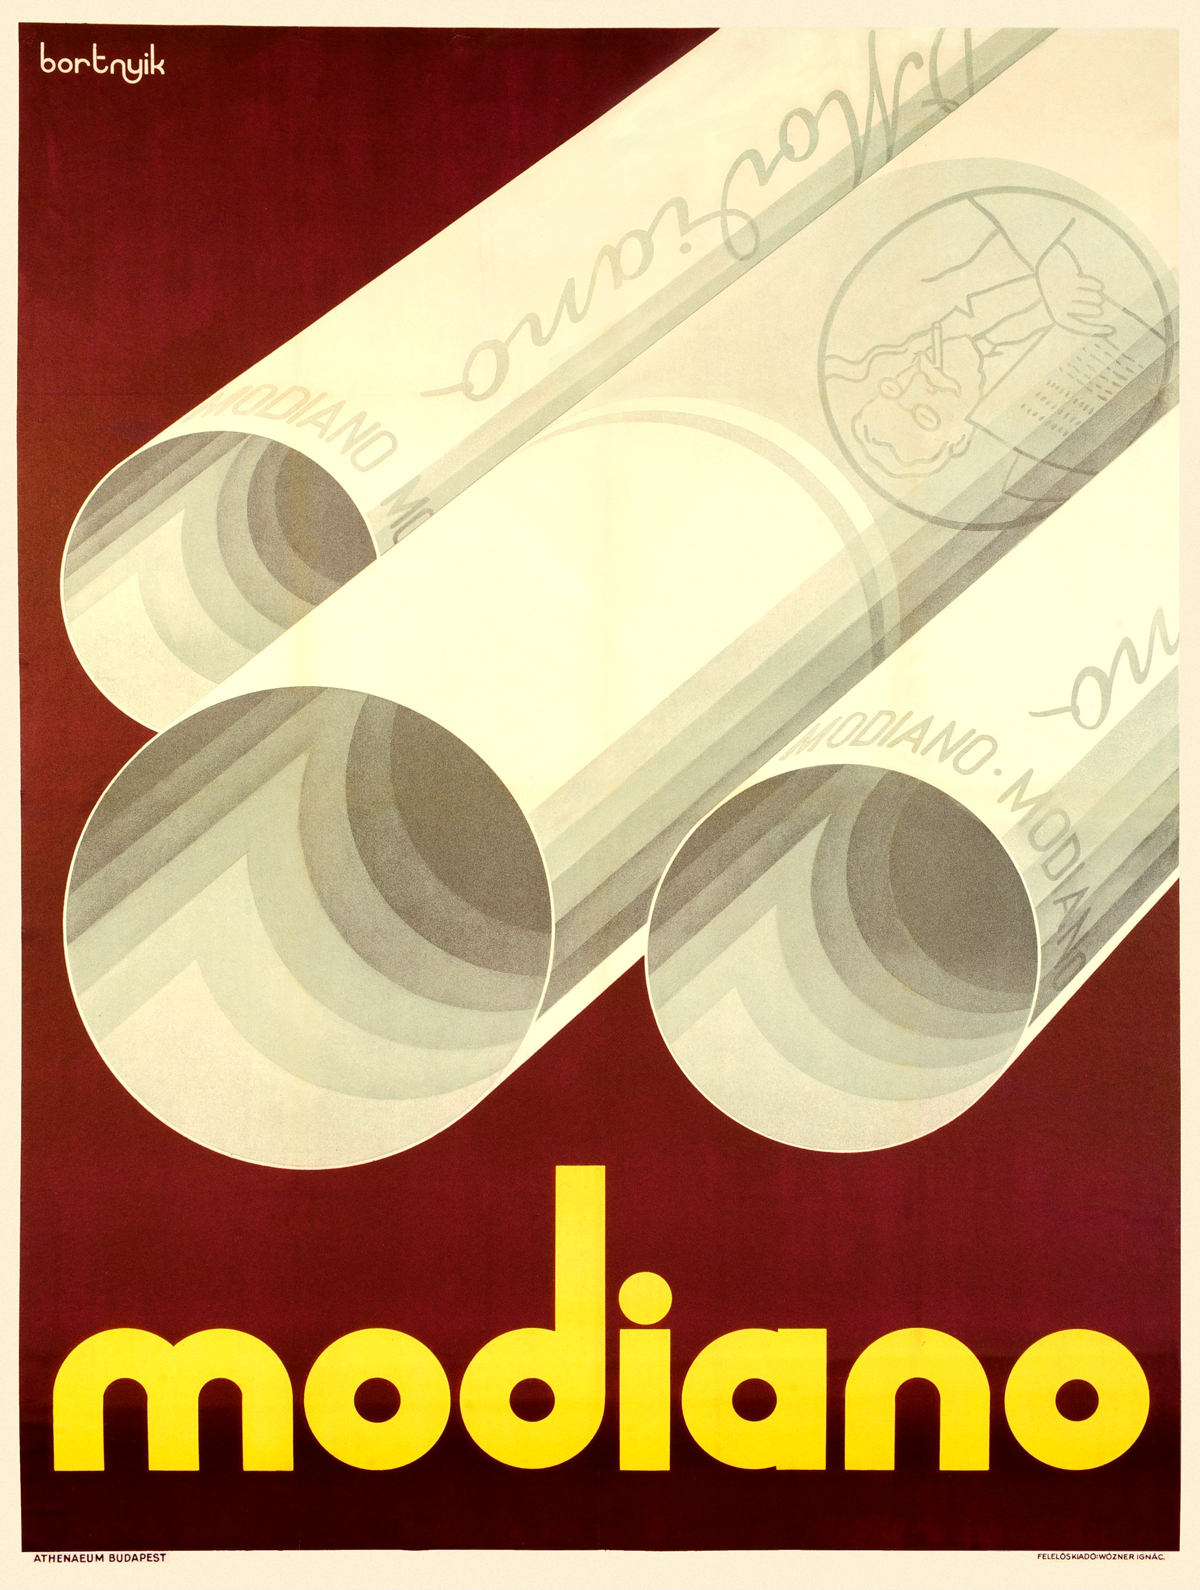 Modiano Cigarette Poster #1 by Sándor Bortnyik #1